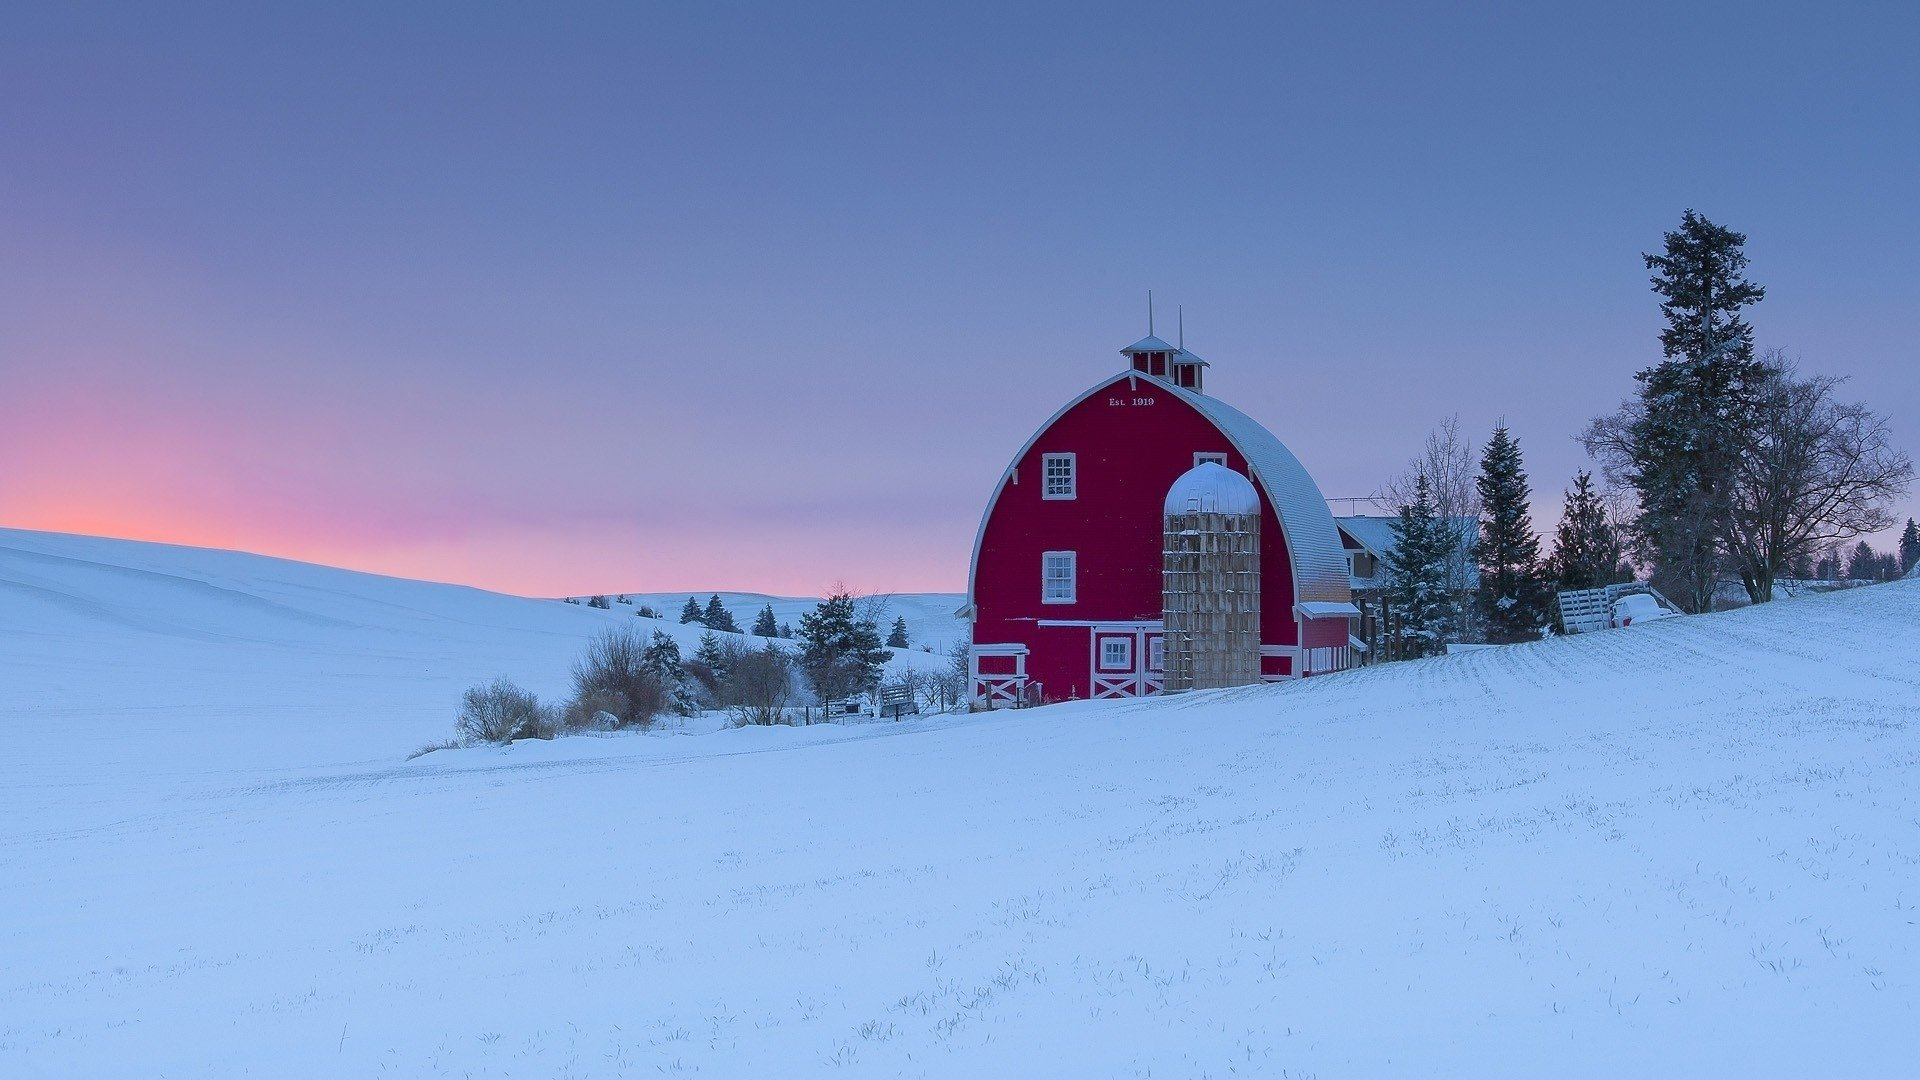 Barn and silo in winter sunset hd wallpaper background image 1920x1080 id 782108 - Winter farm scenes wallpaper ...